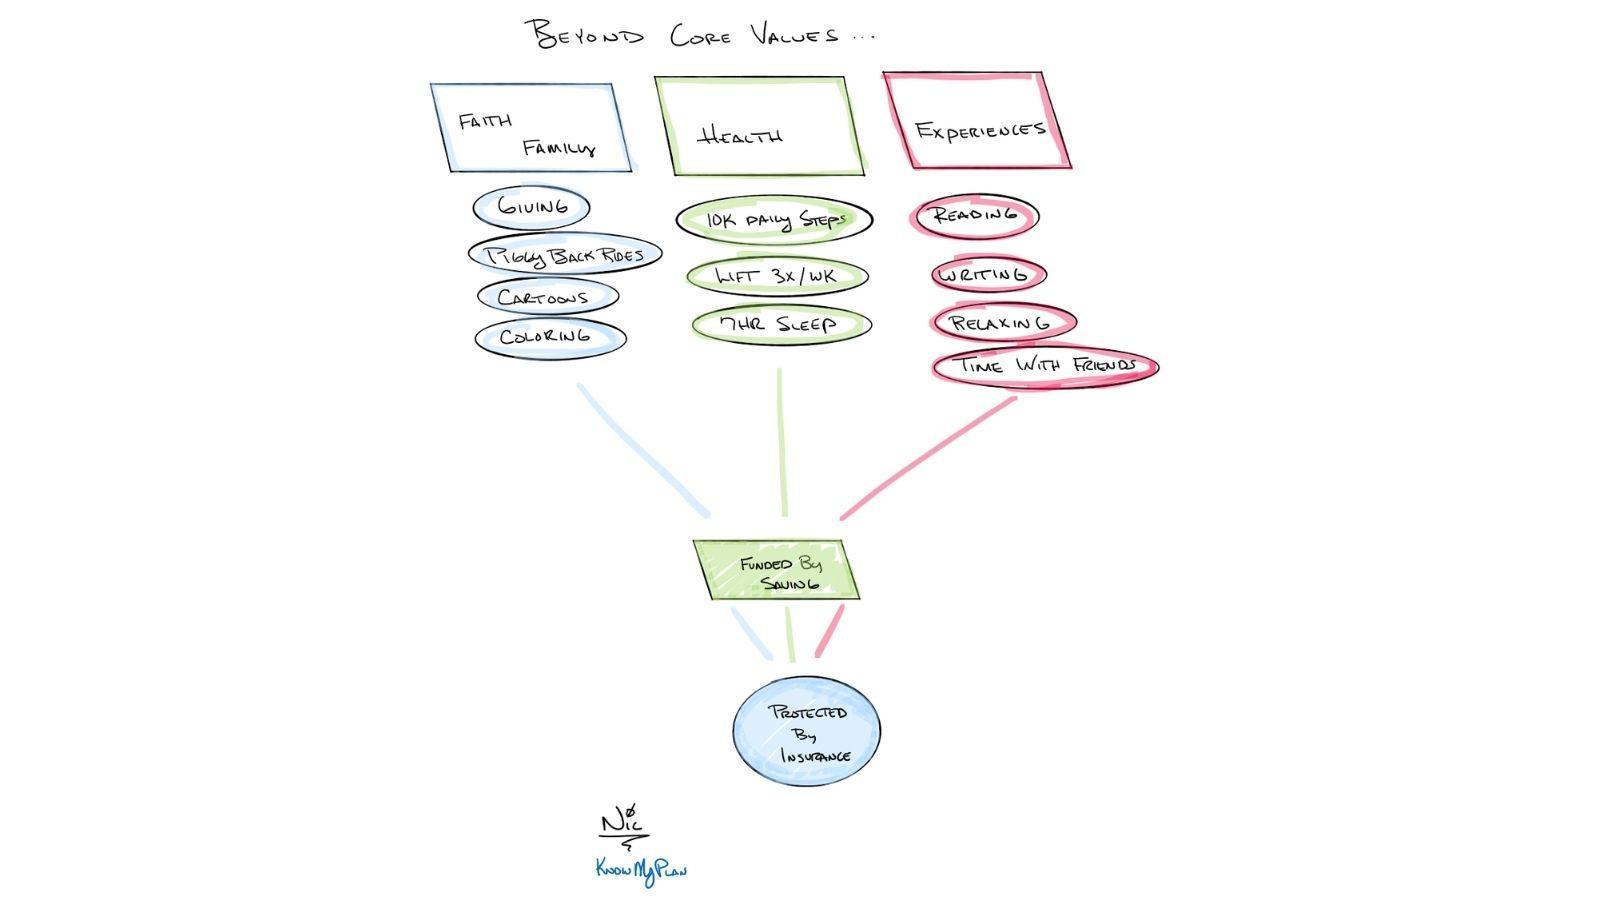 Beyond Core Values Thumbnail